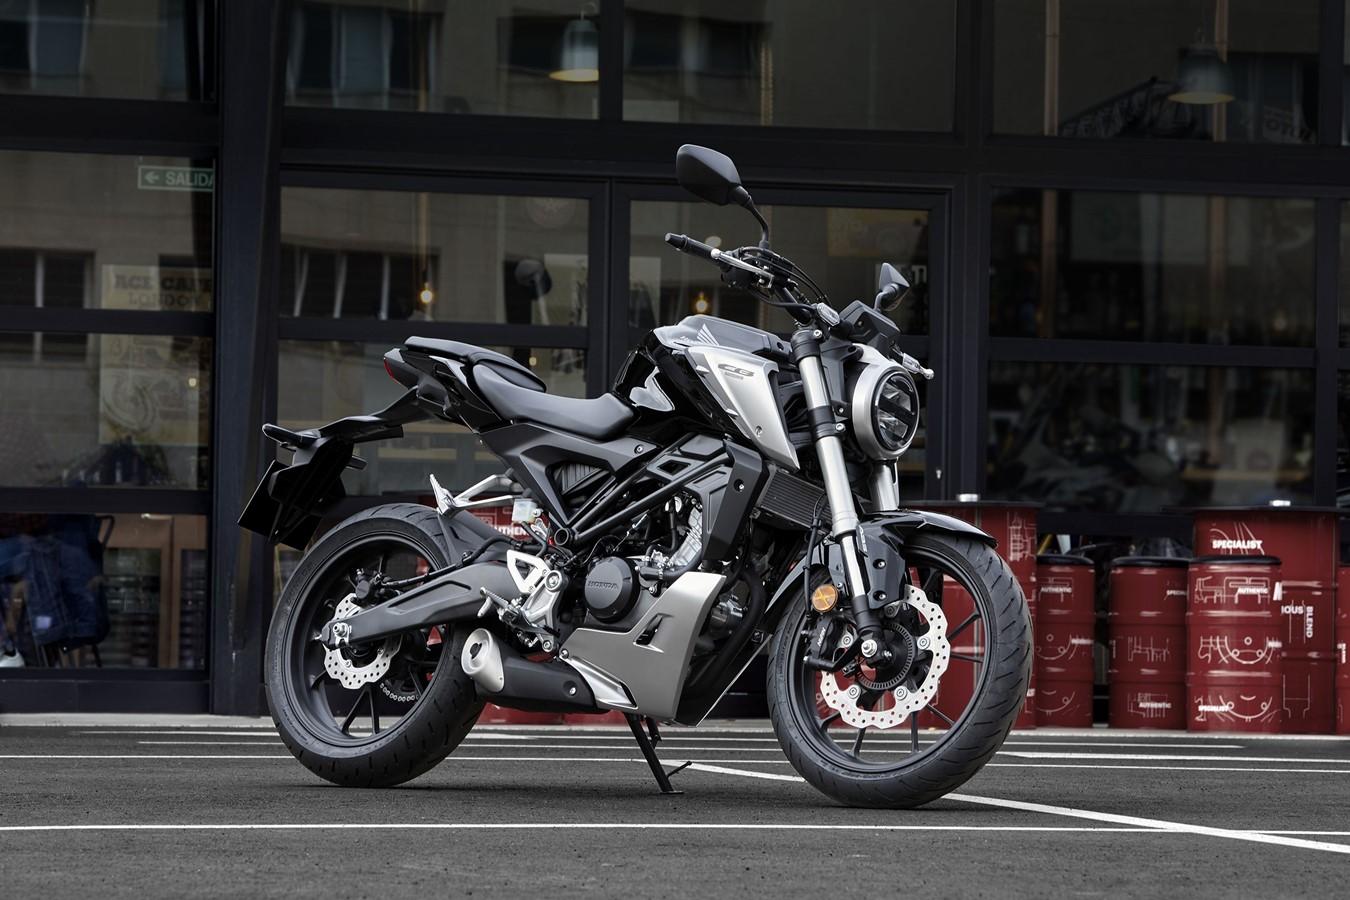 Honda CB125R   Zubehör   Sports Café Racer   Naked Bikes